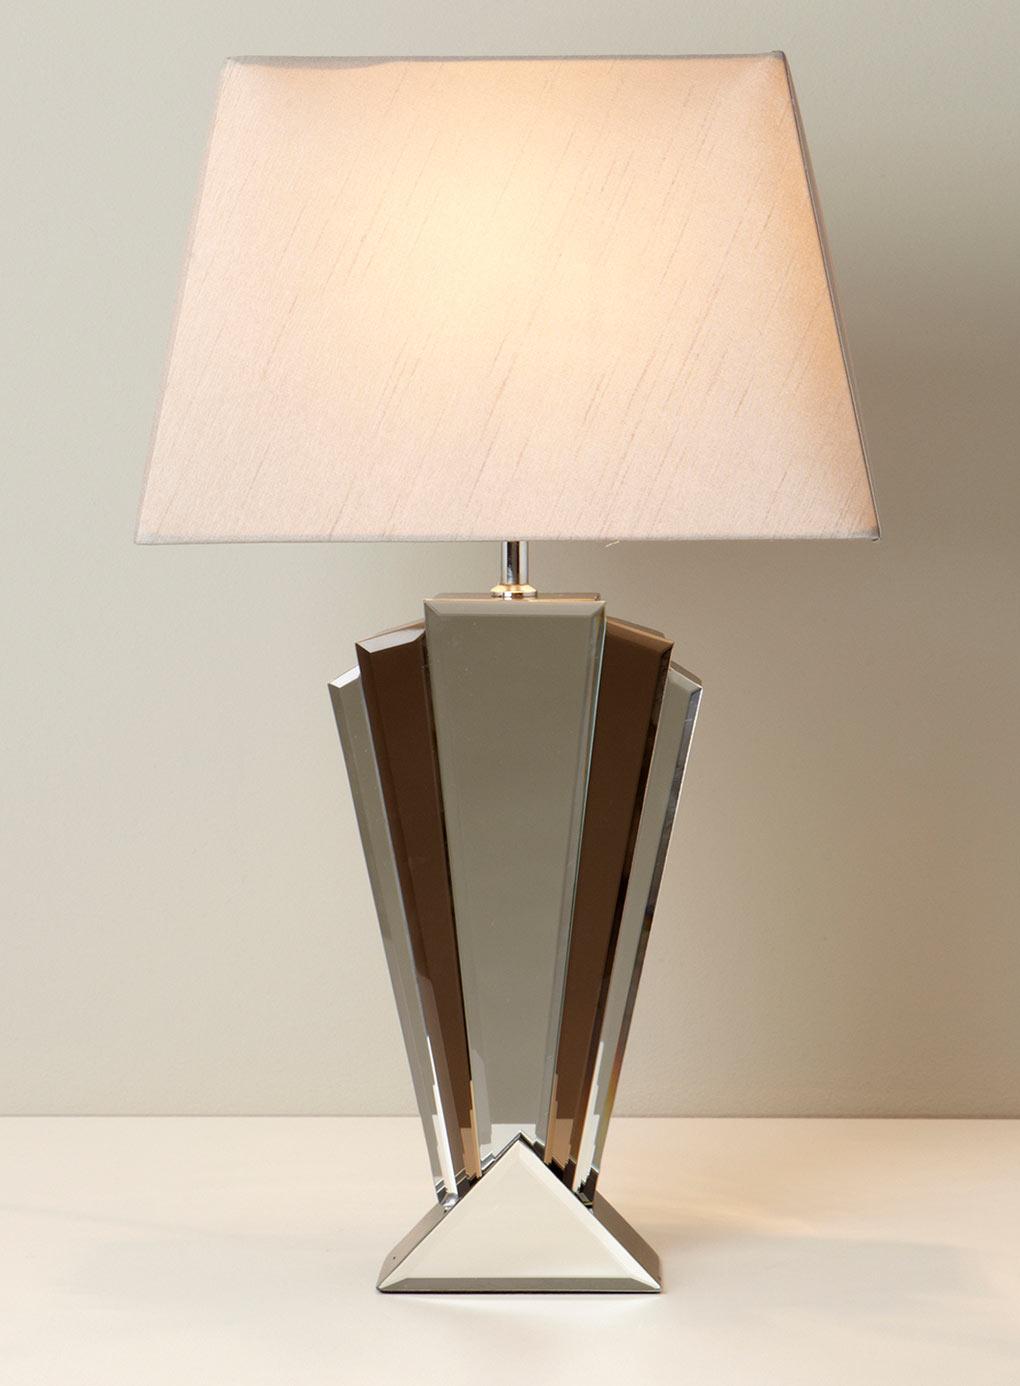 art deco table lamps photo - 10